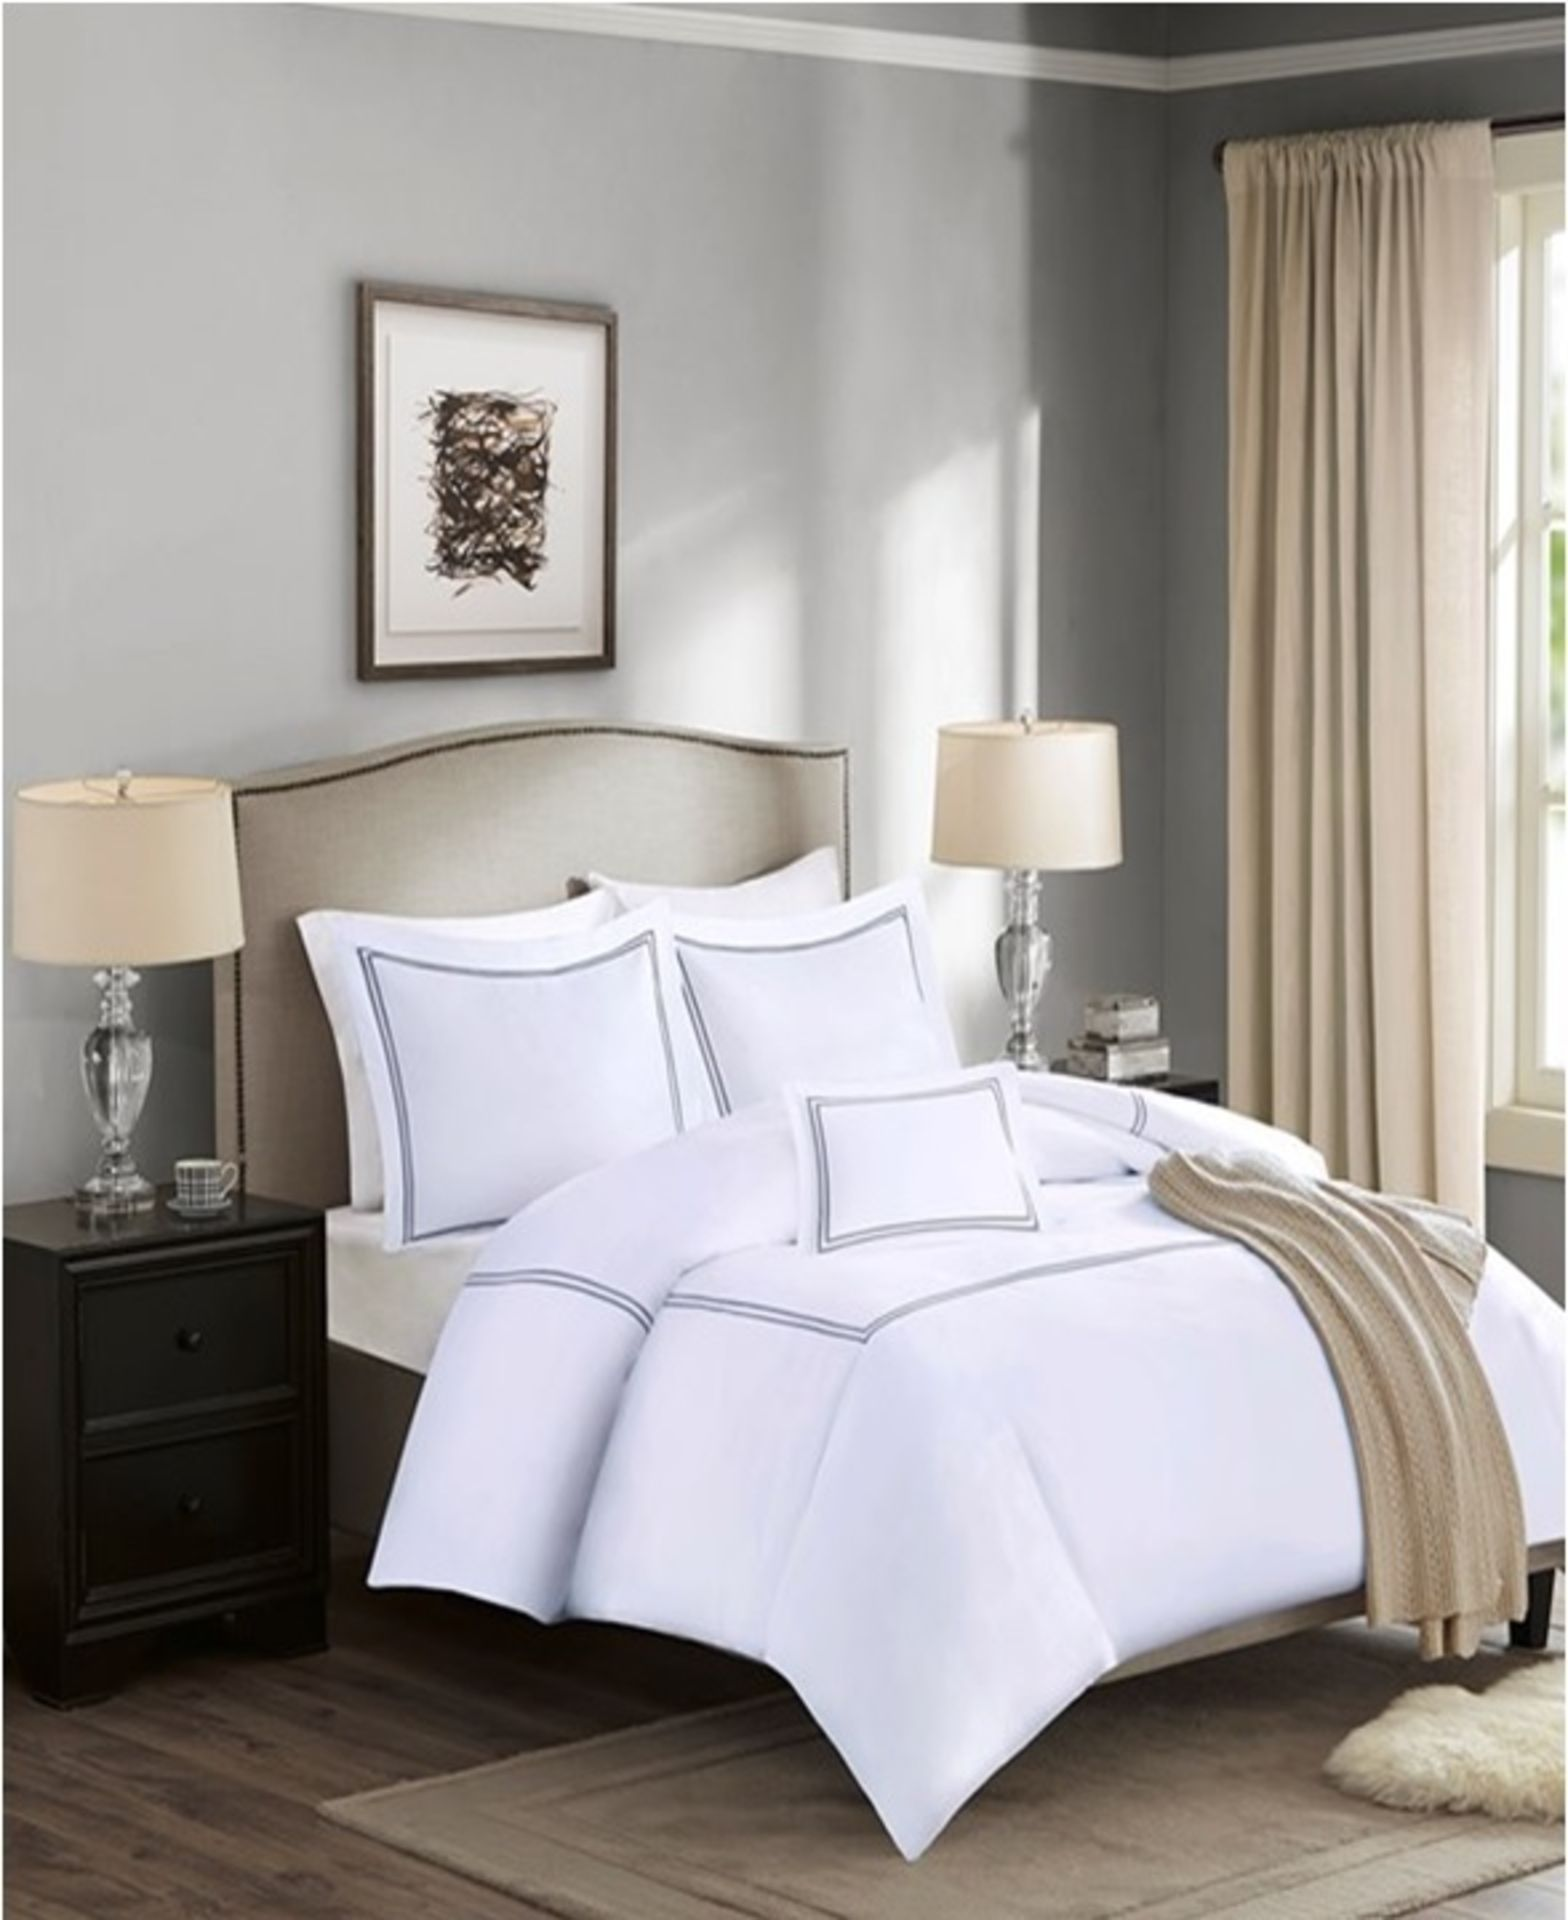 Lot 138 - 1 x Madison Park Luxury Collection Single Duvet Set White - Product Code MP12-0197UK (Brand New -